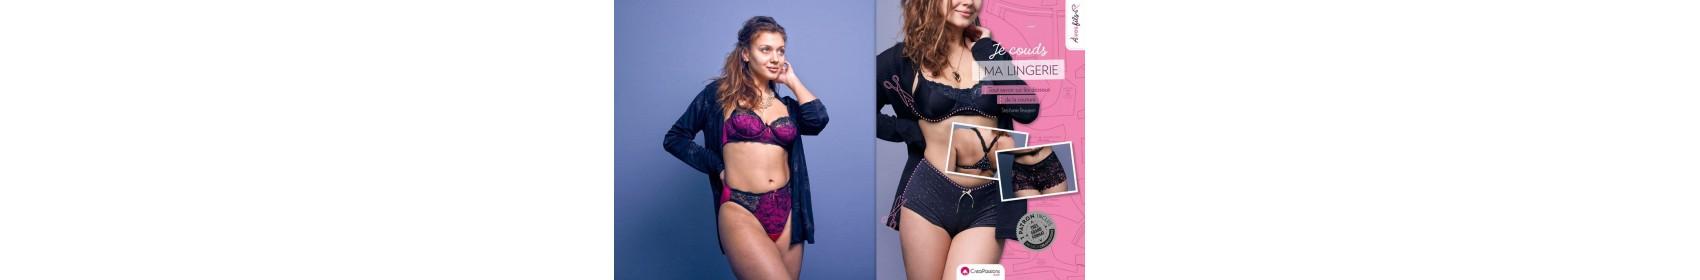 Livre Stéphanie Beaujean / SB couture